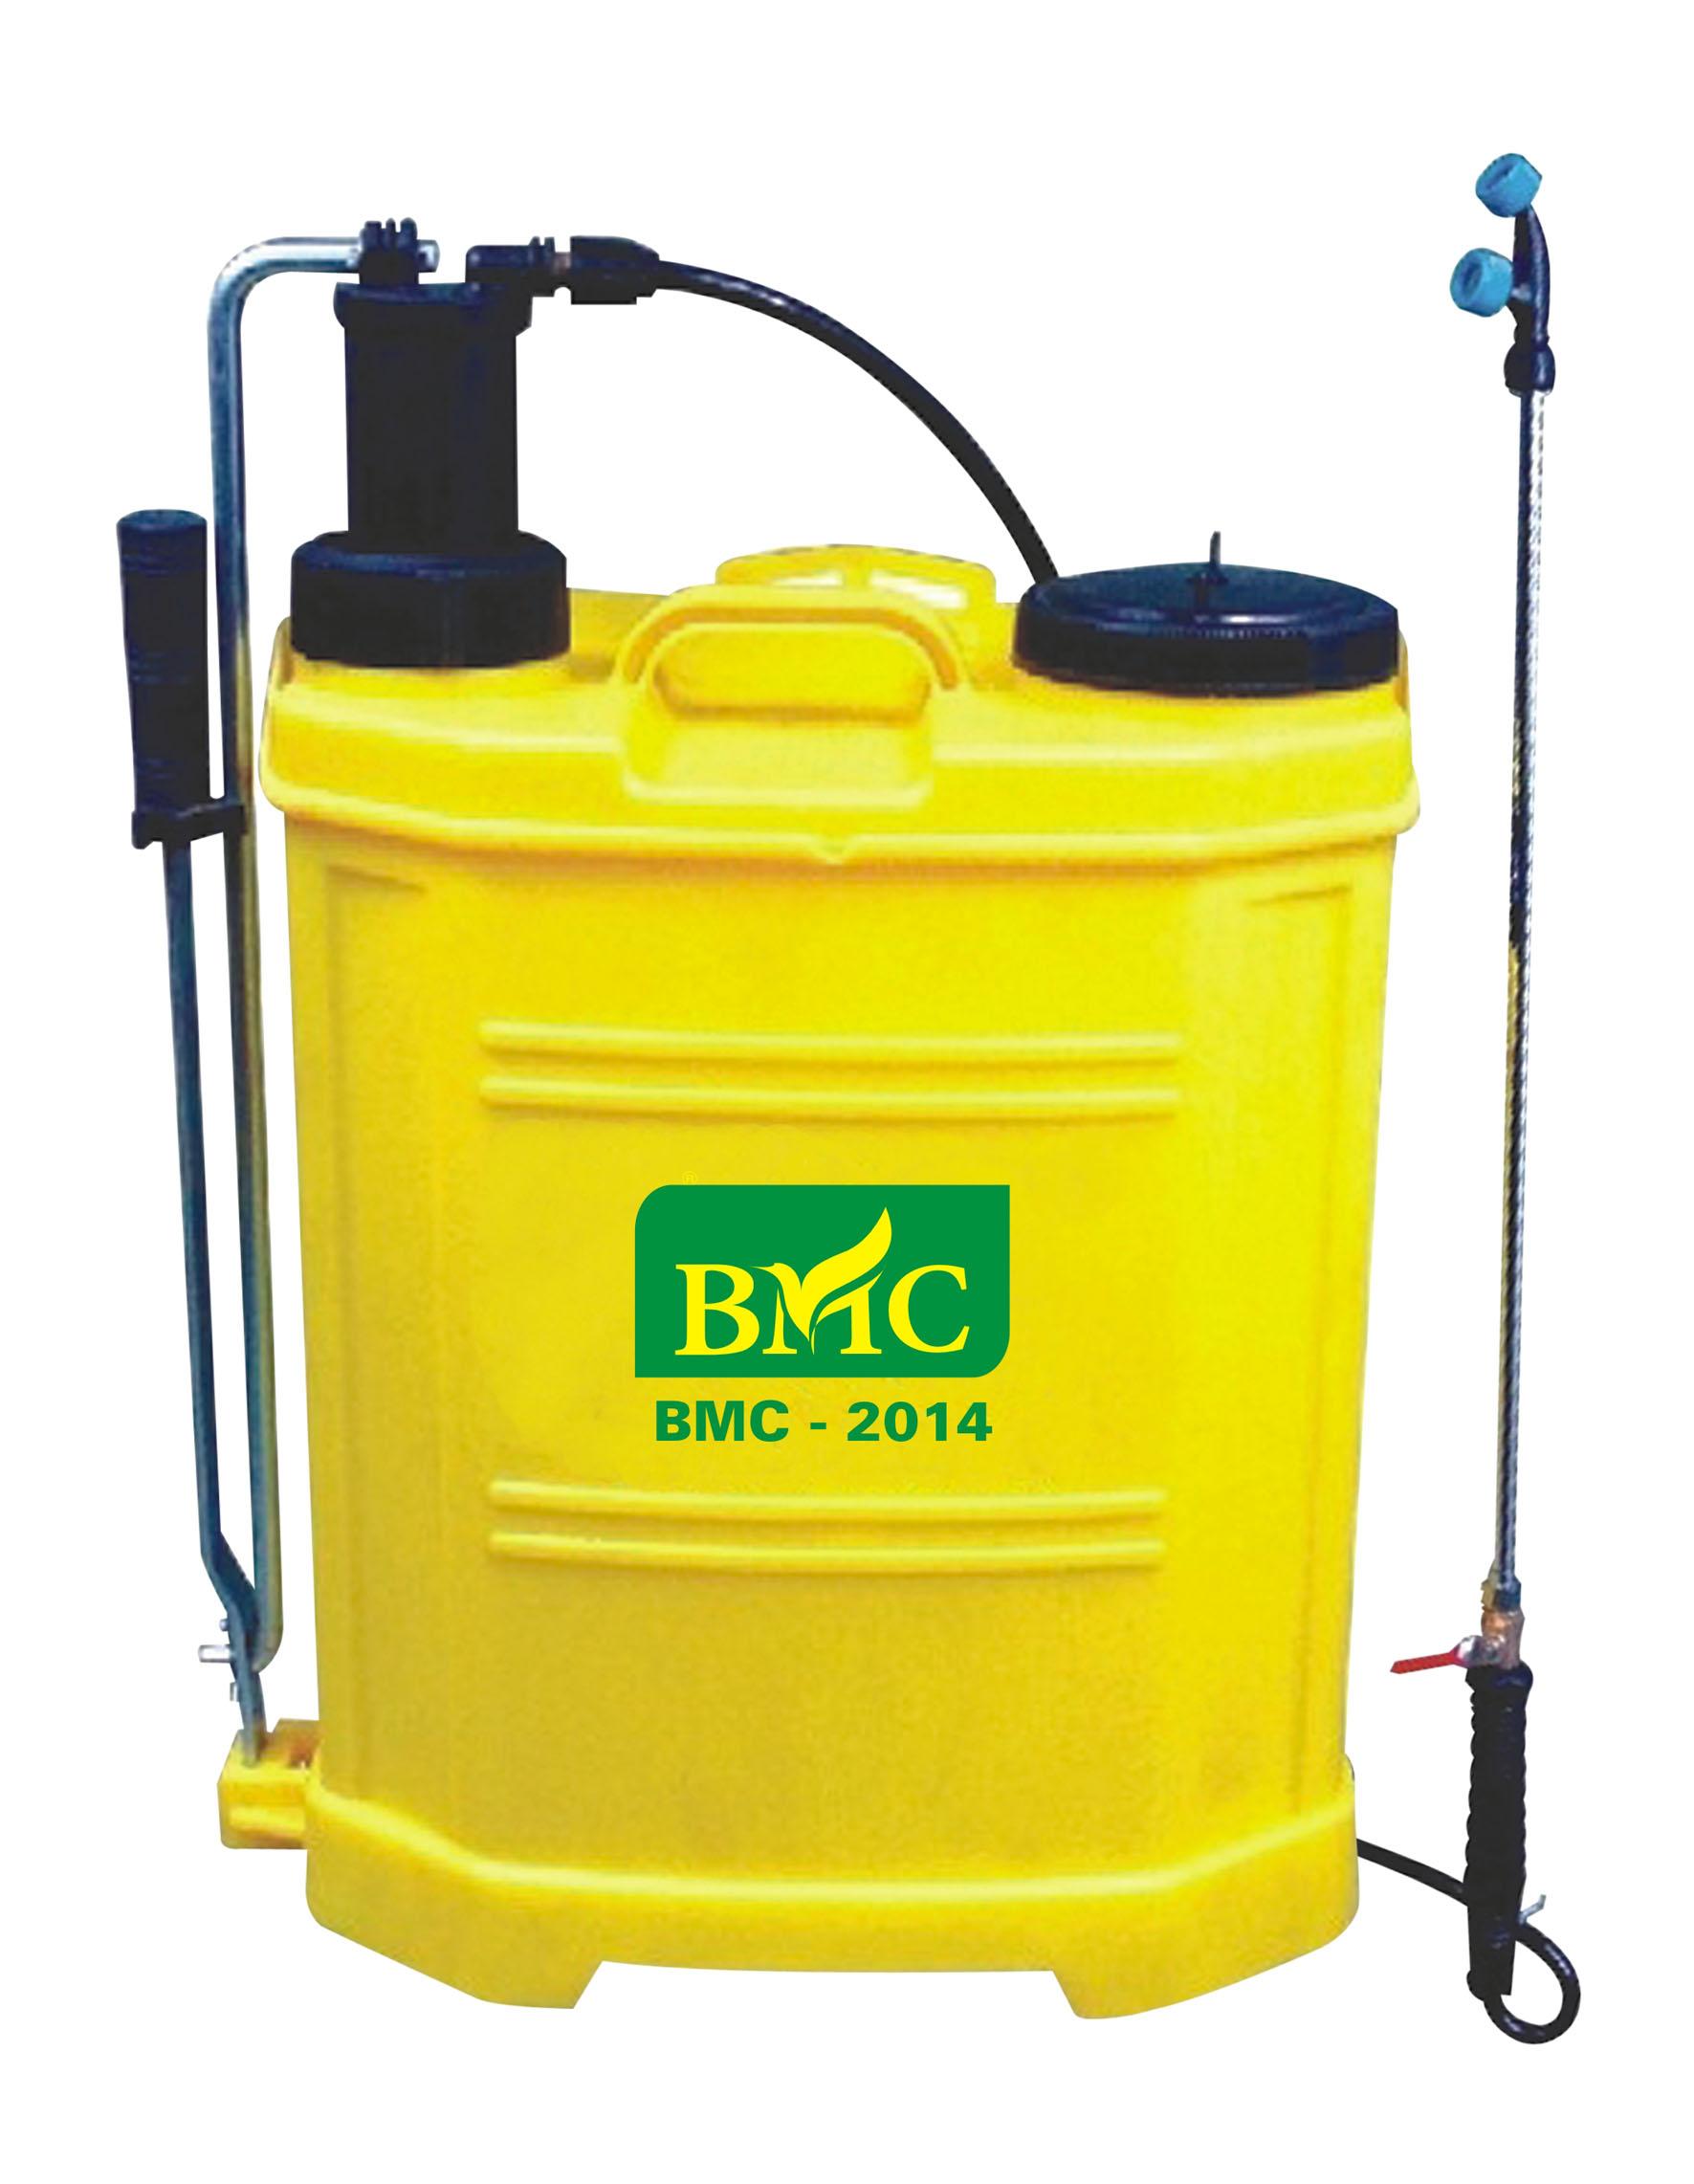 Bình phun thuốc BMC 18L 2.0 Gold LA BMC